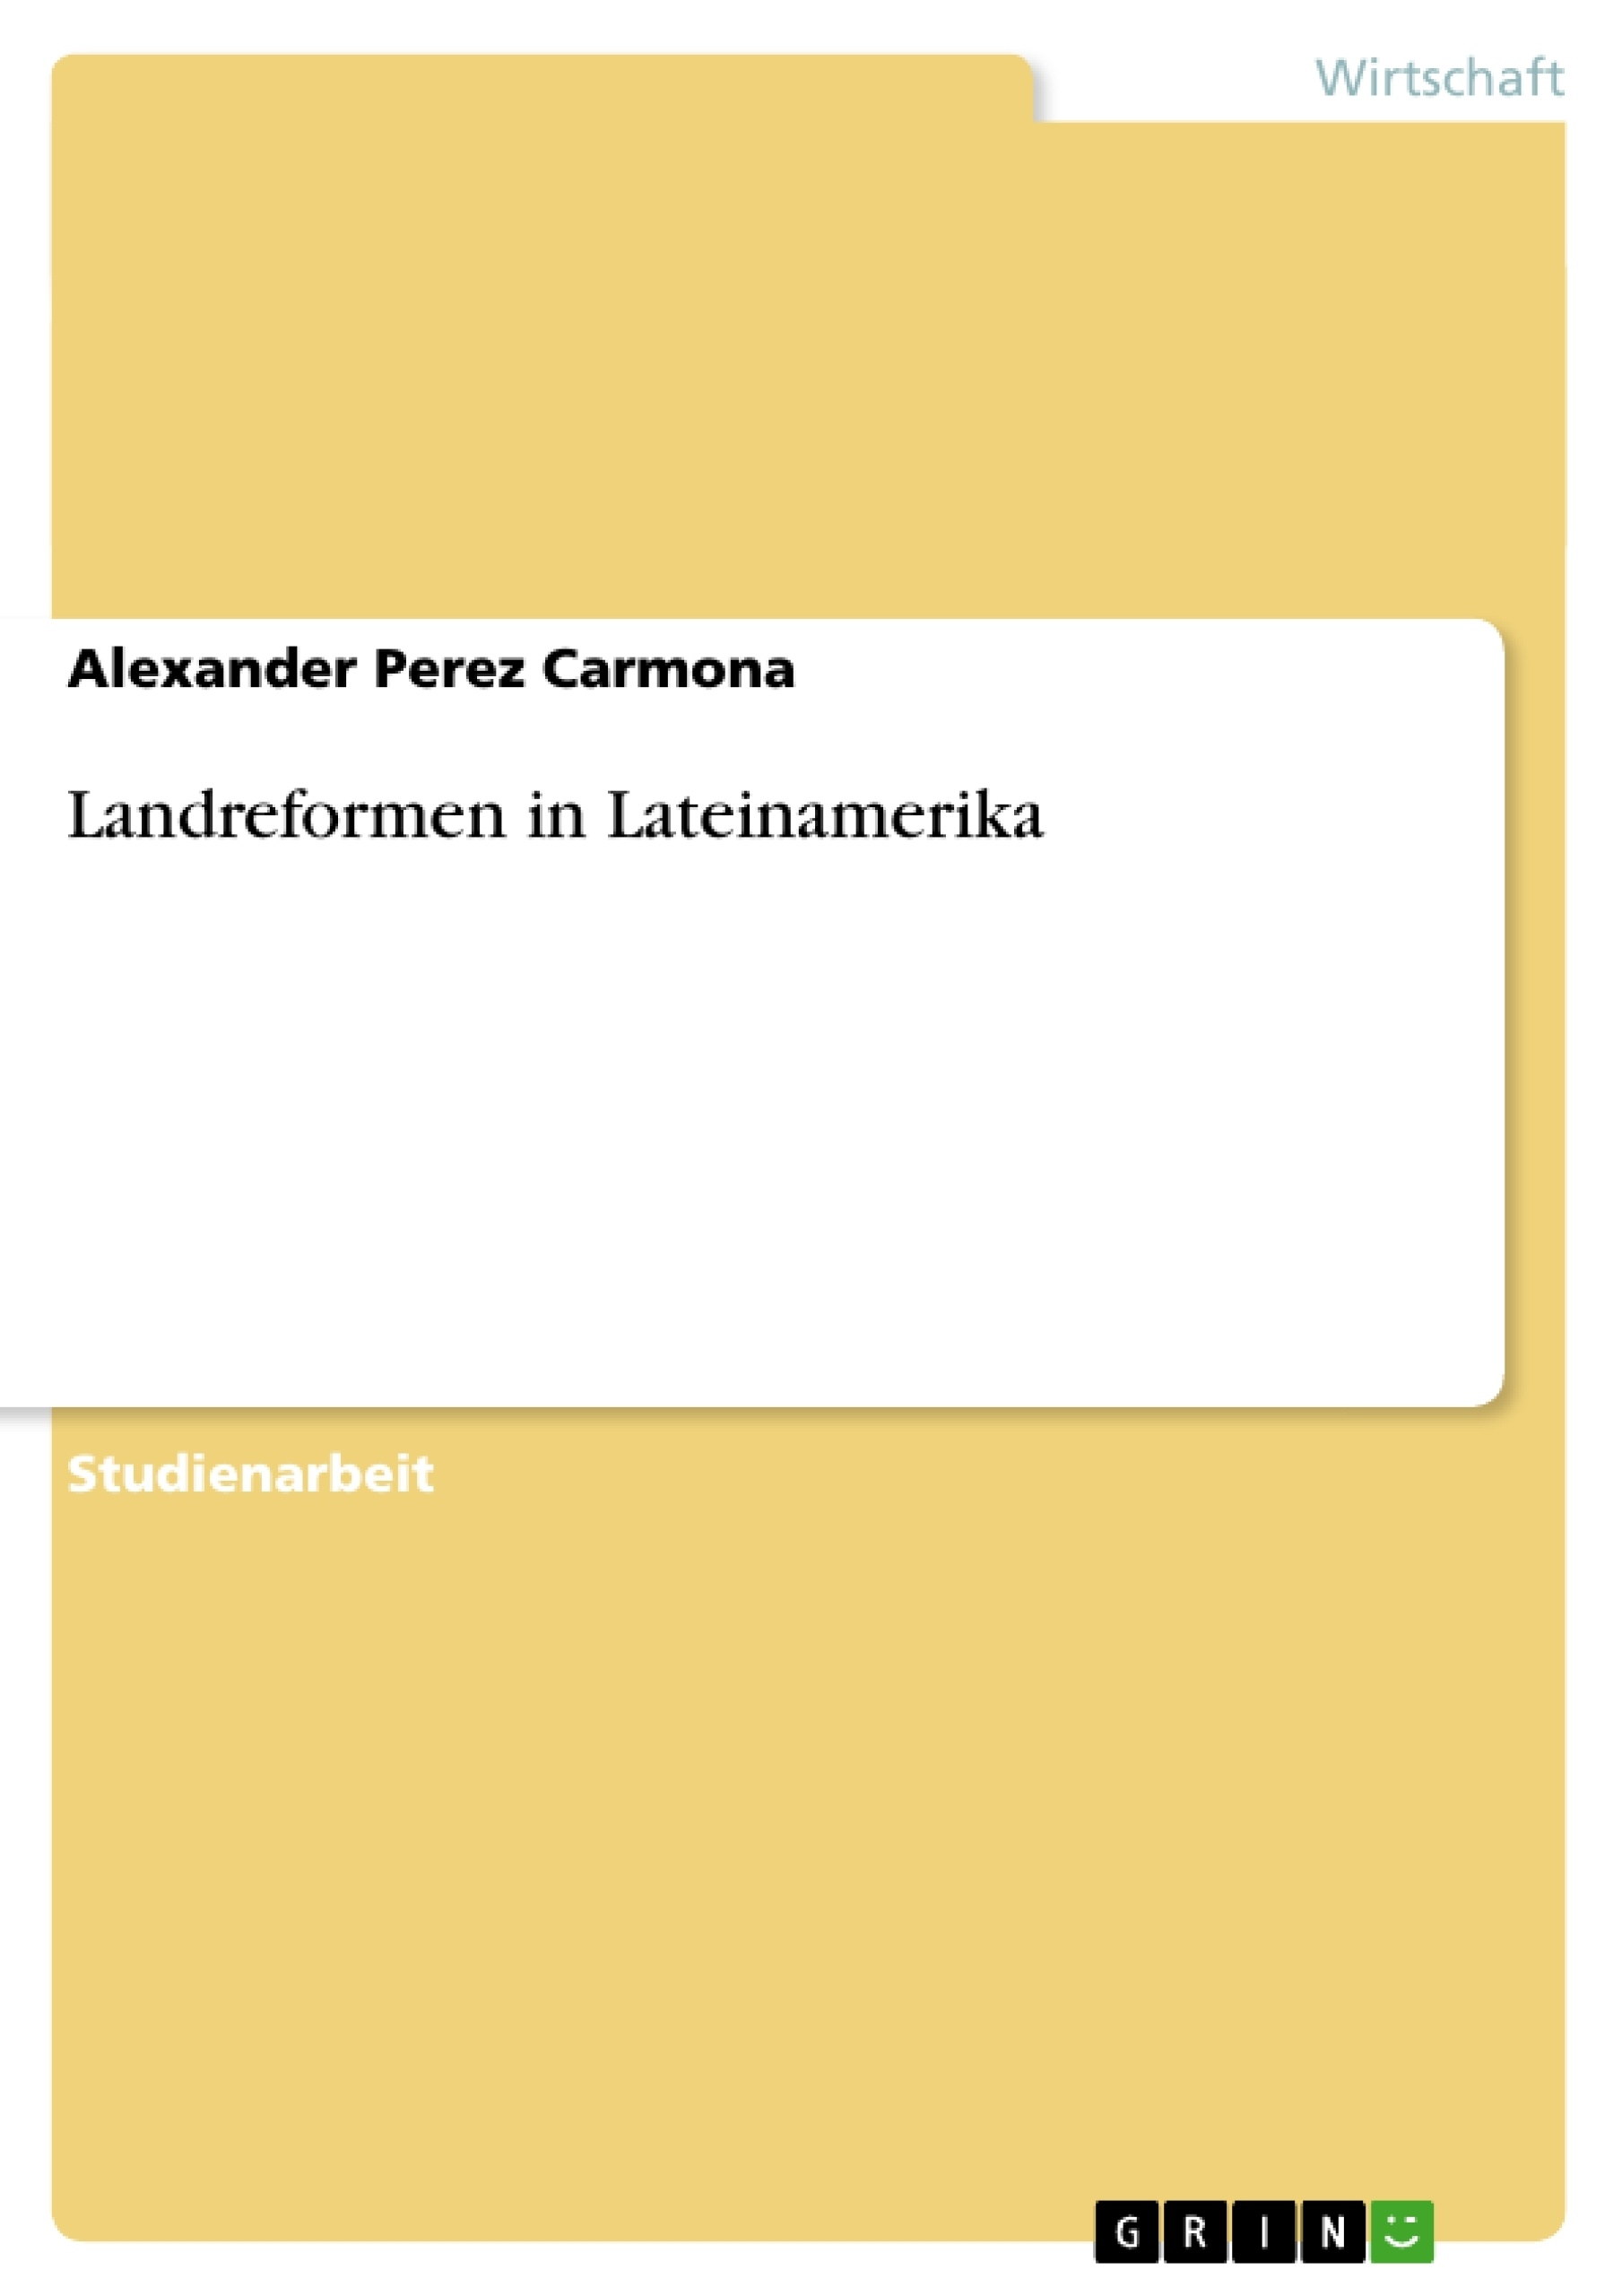 Titel: Landreformen in Lateinamerika